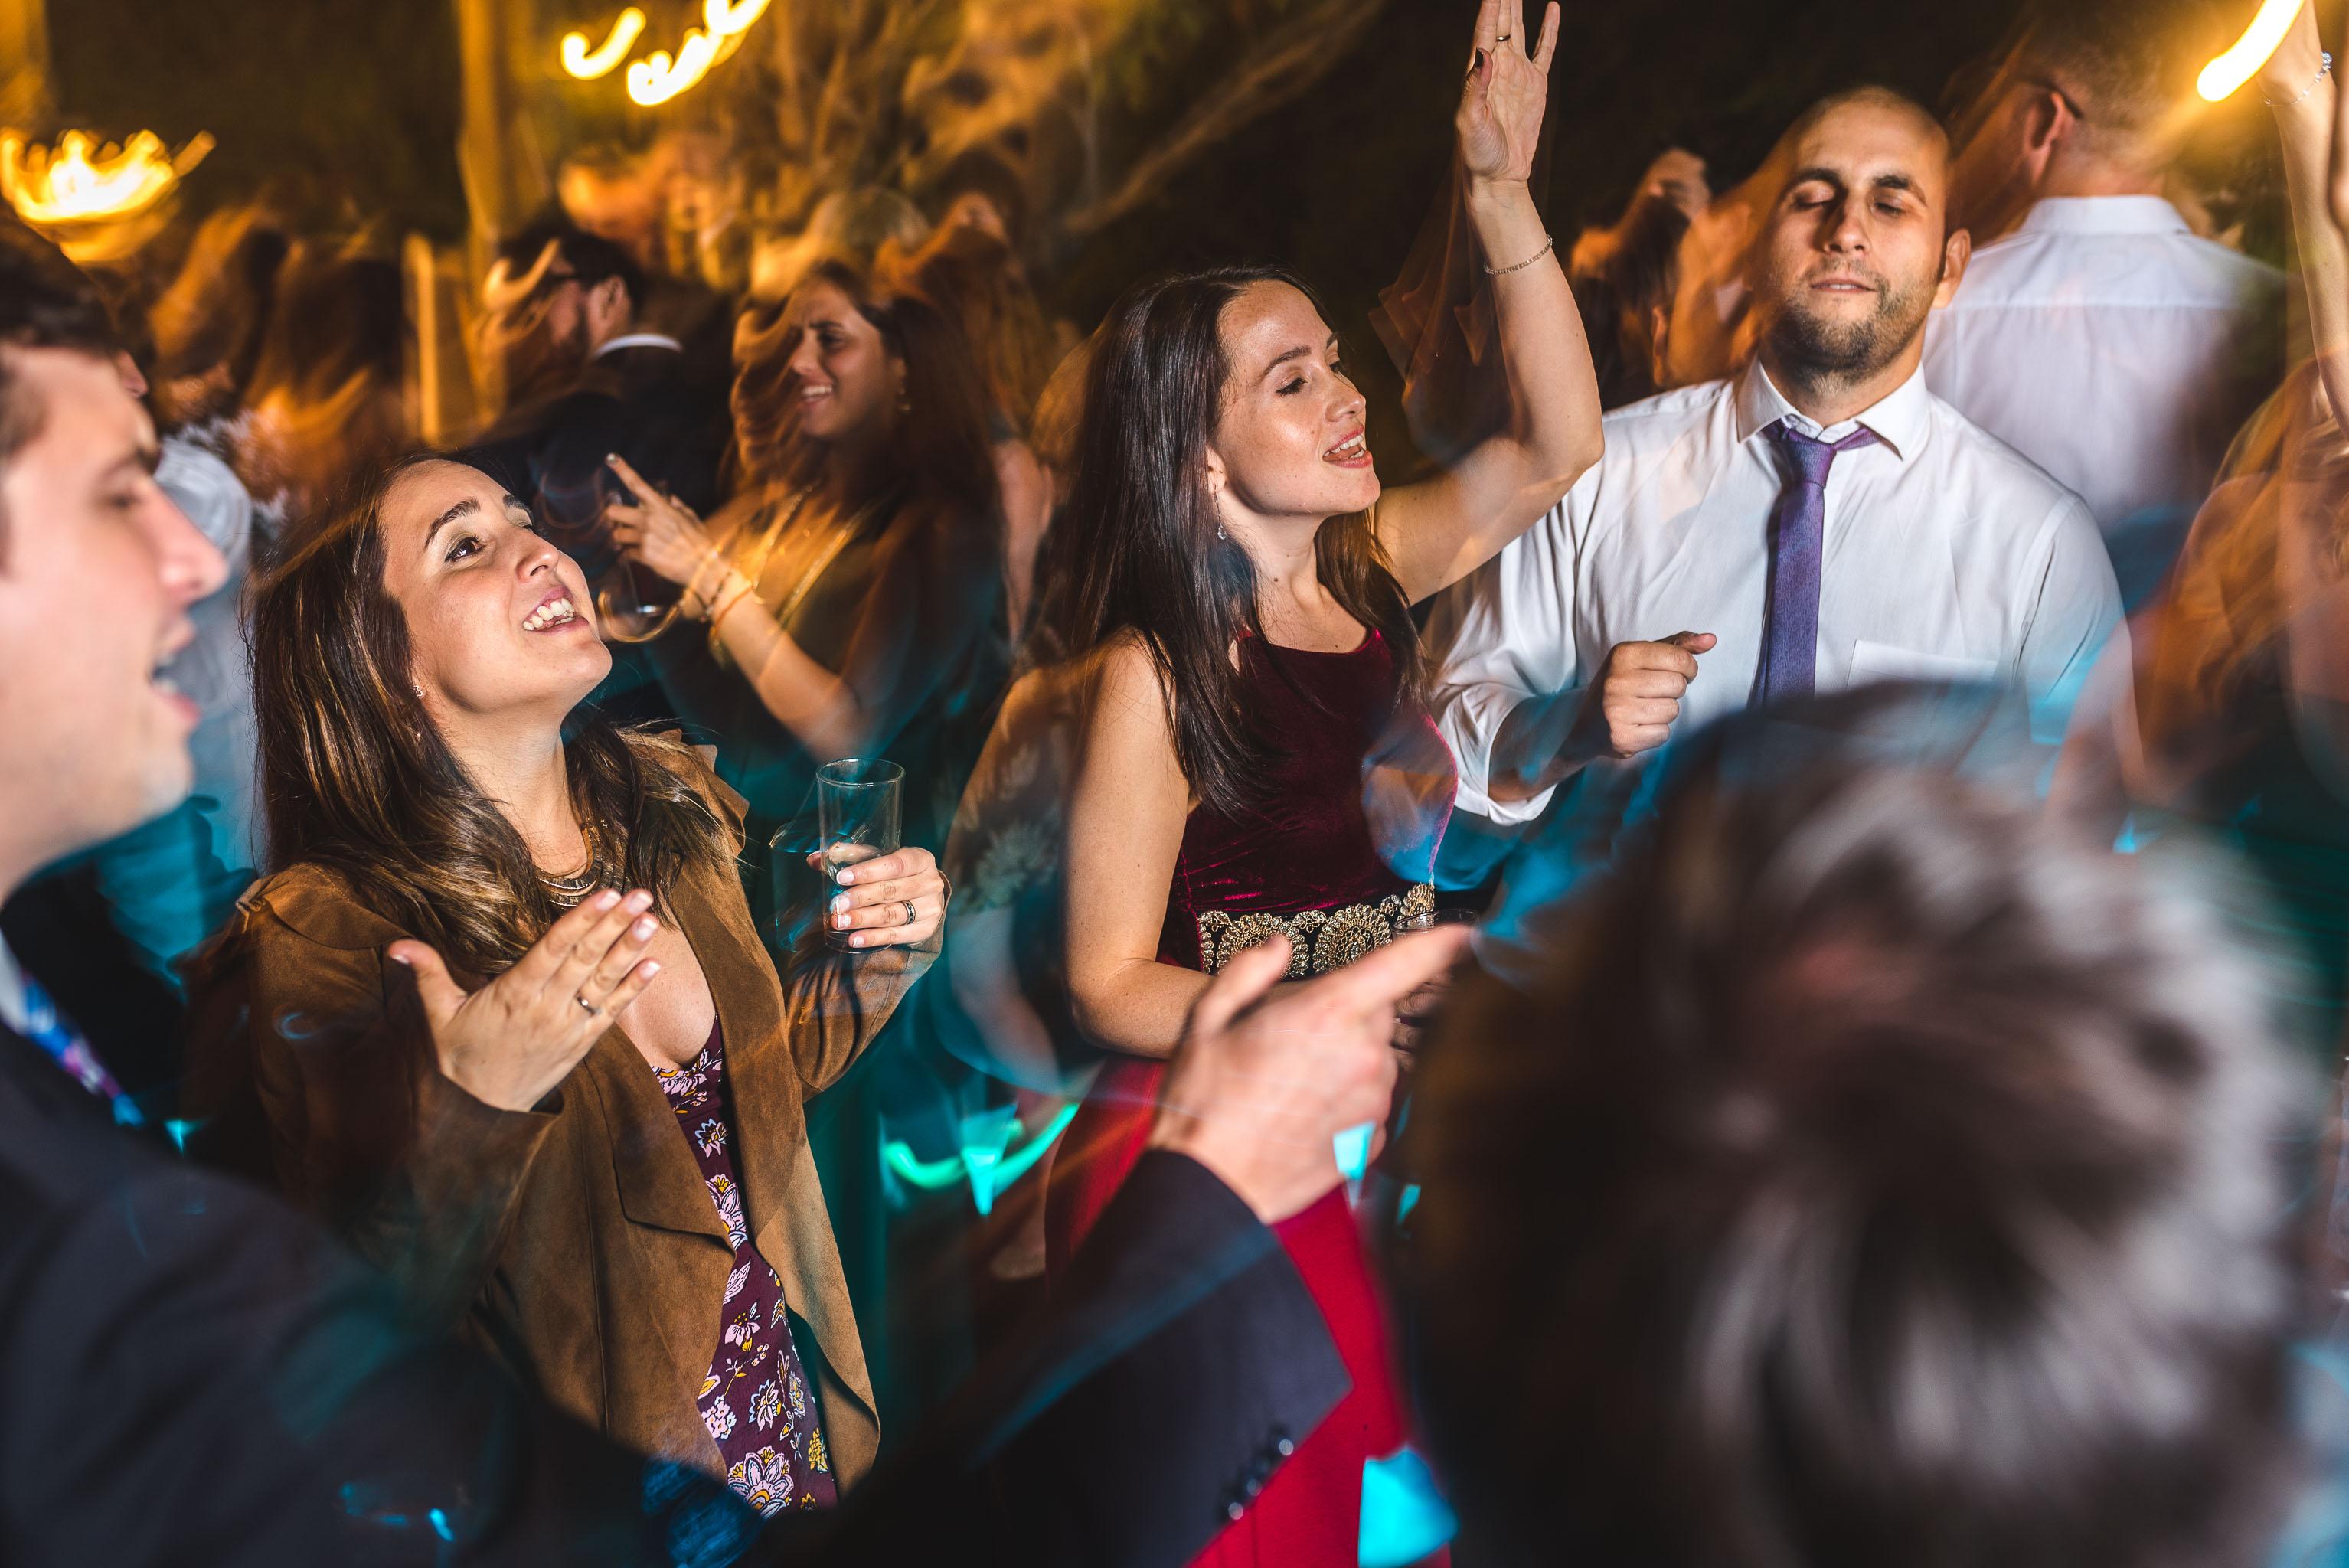 fotografo documental de matrimonios-fotografo matrimonio santiago-fiesta